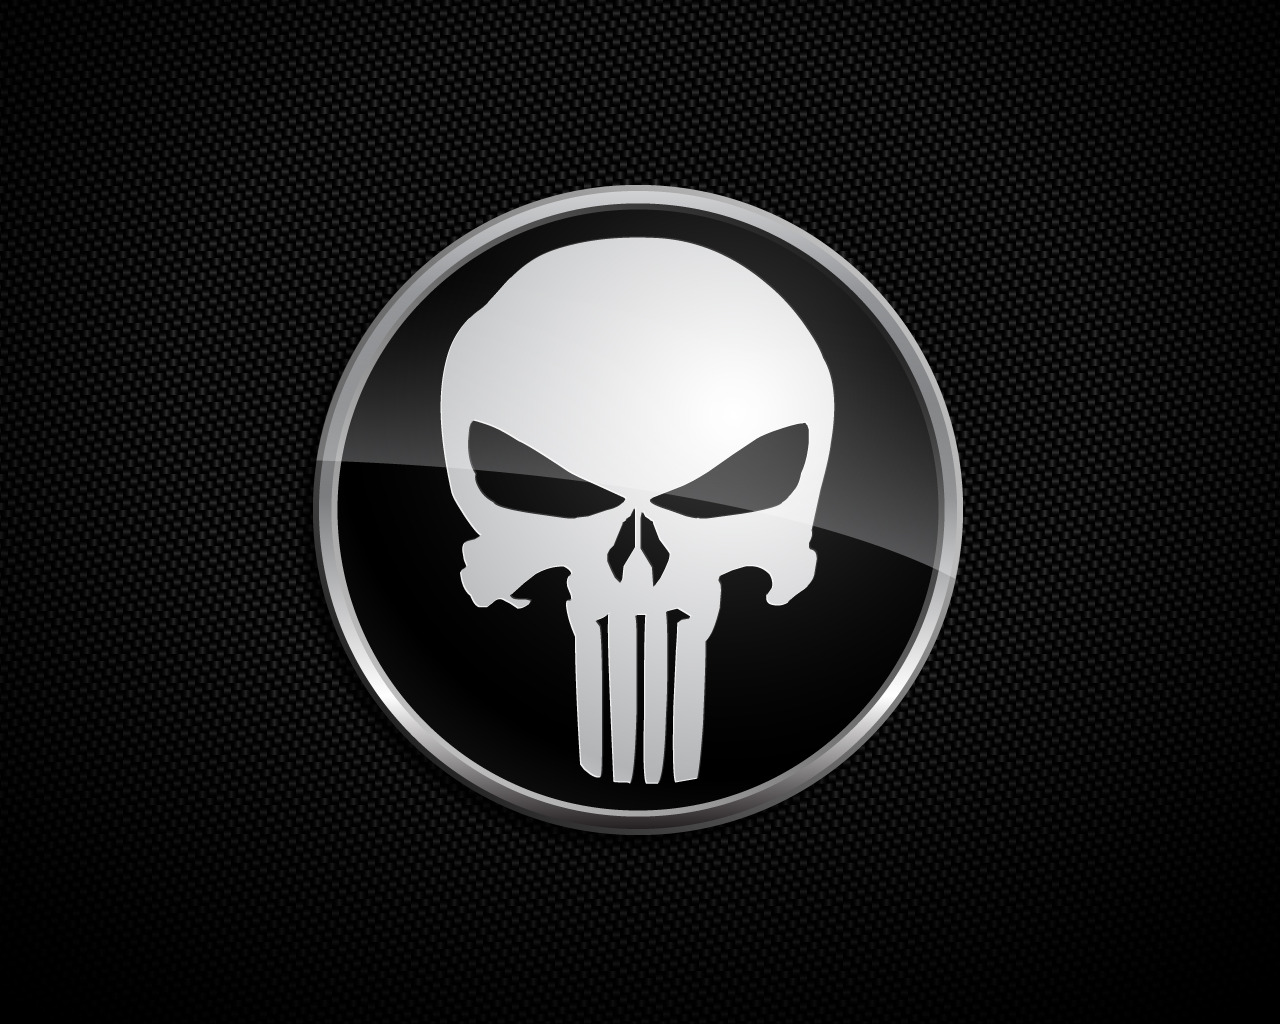 The Punisher Skull Logo HD Wallpapers Desktop Wallpapers 1280x1024